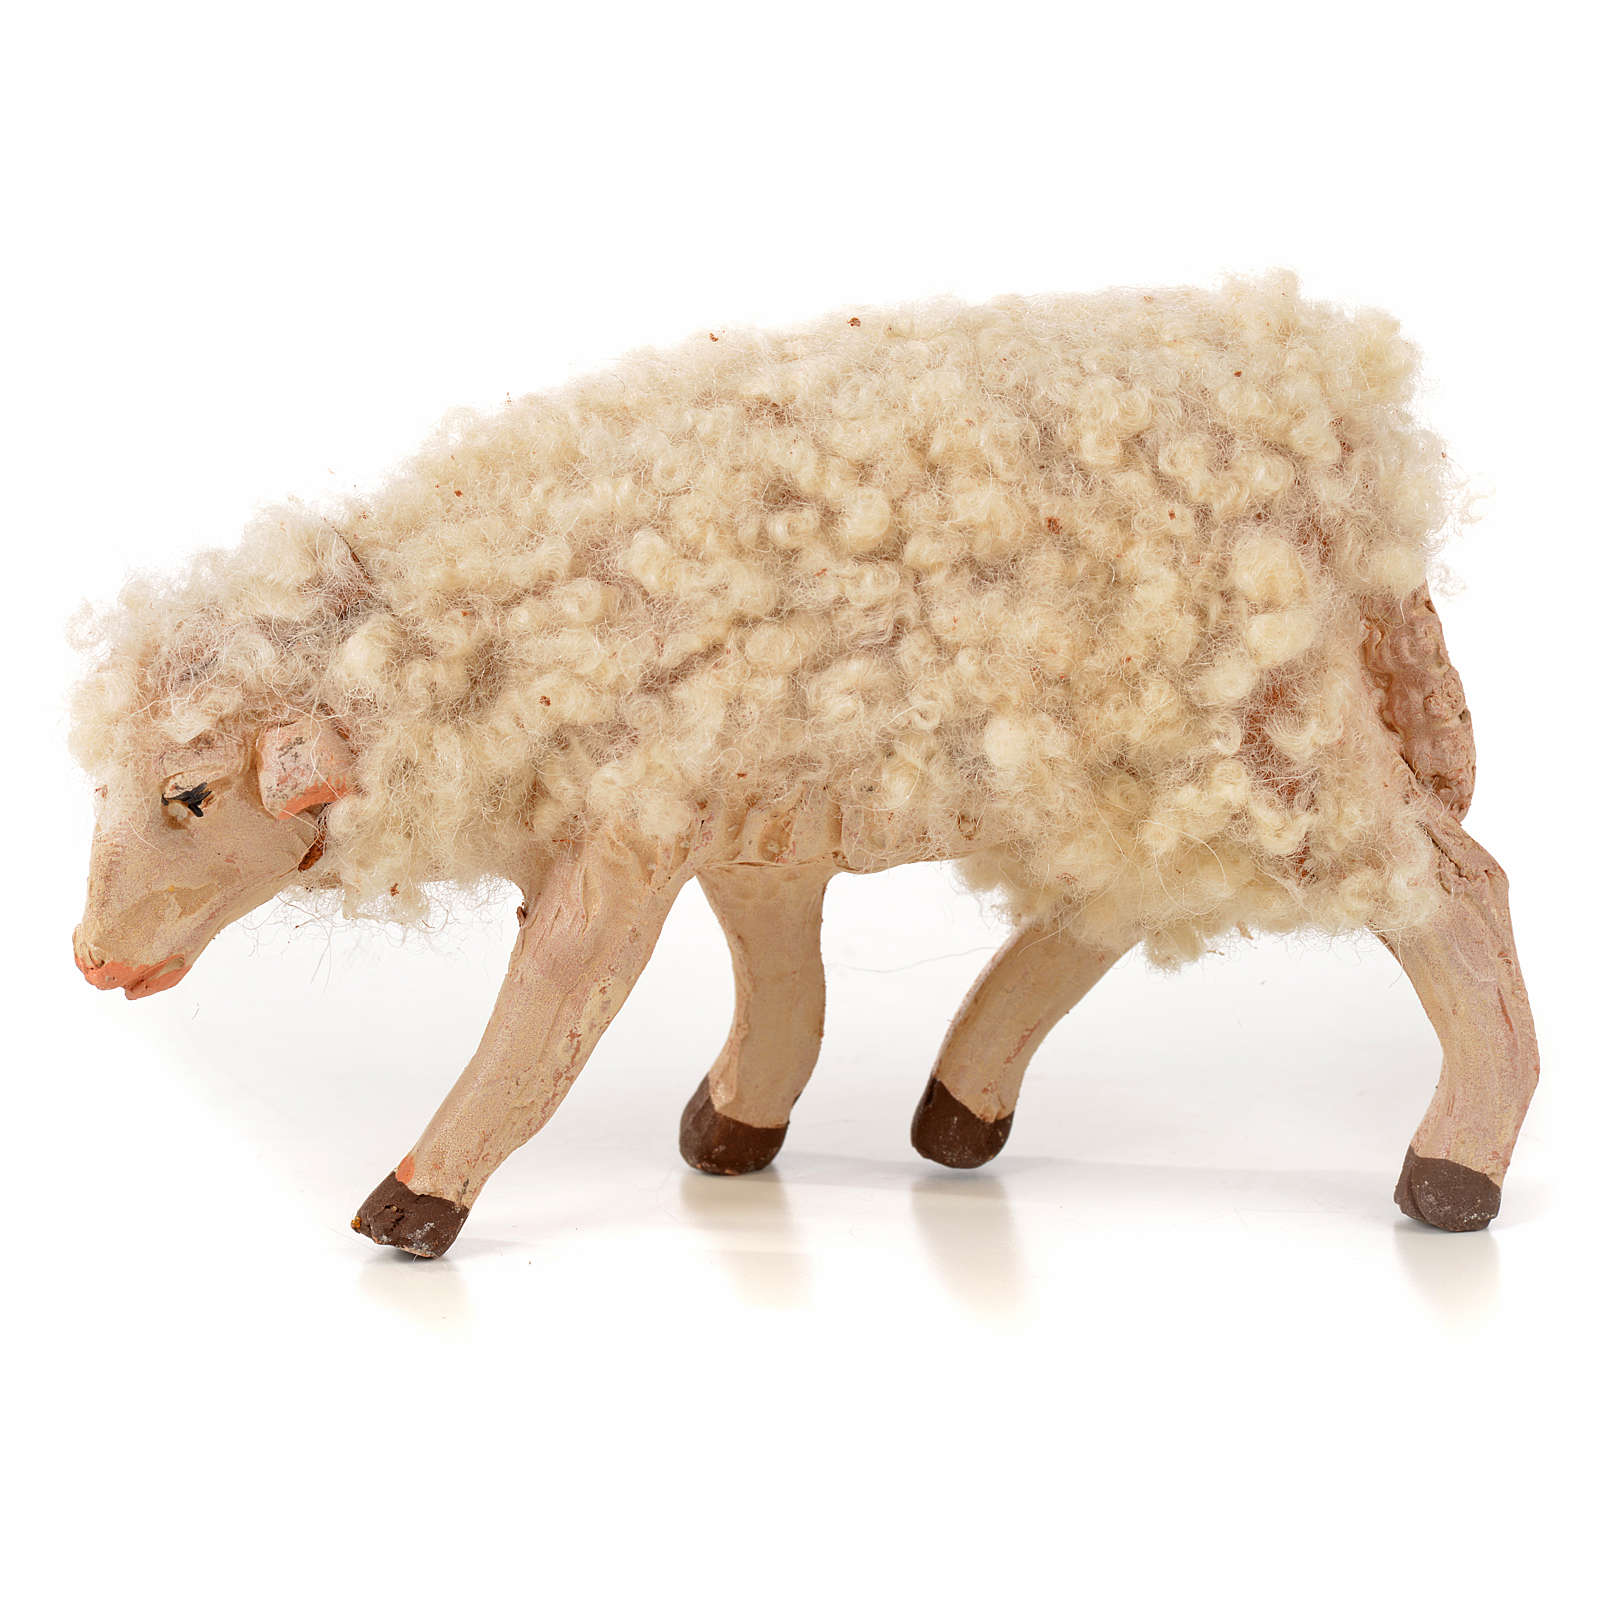 Kit 3 pecore con lana 14 cm presepe napoletano 4